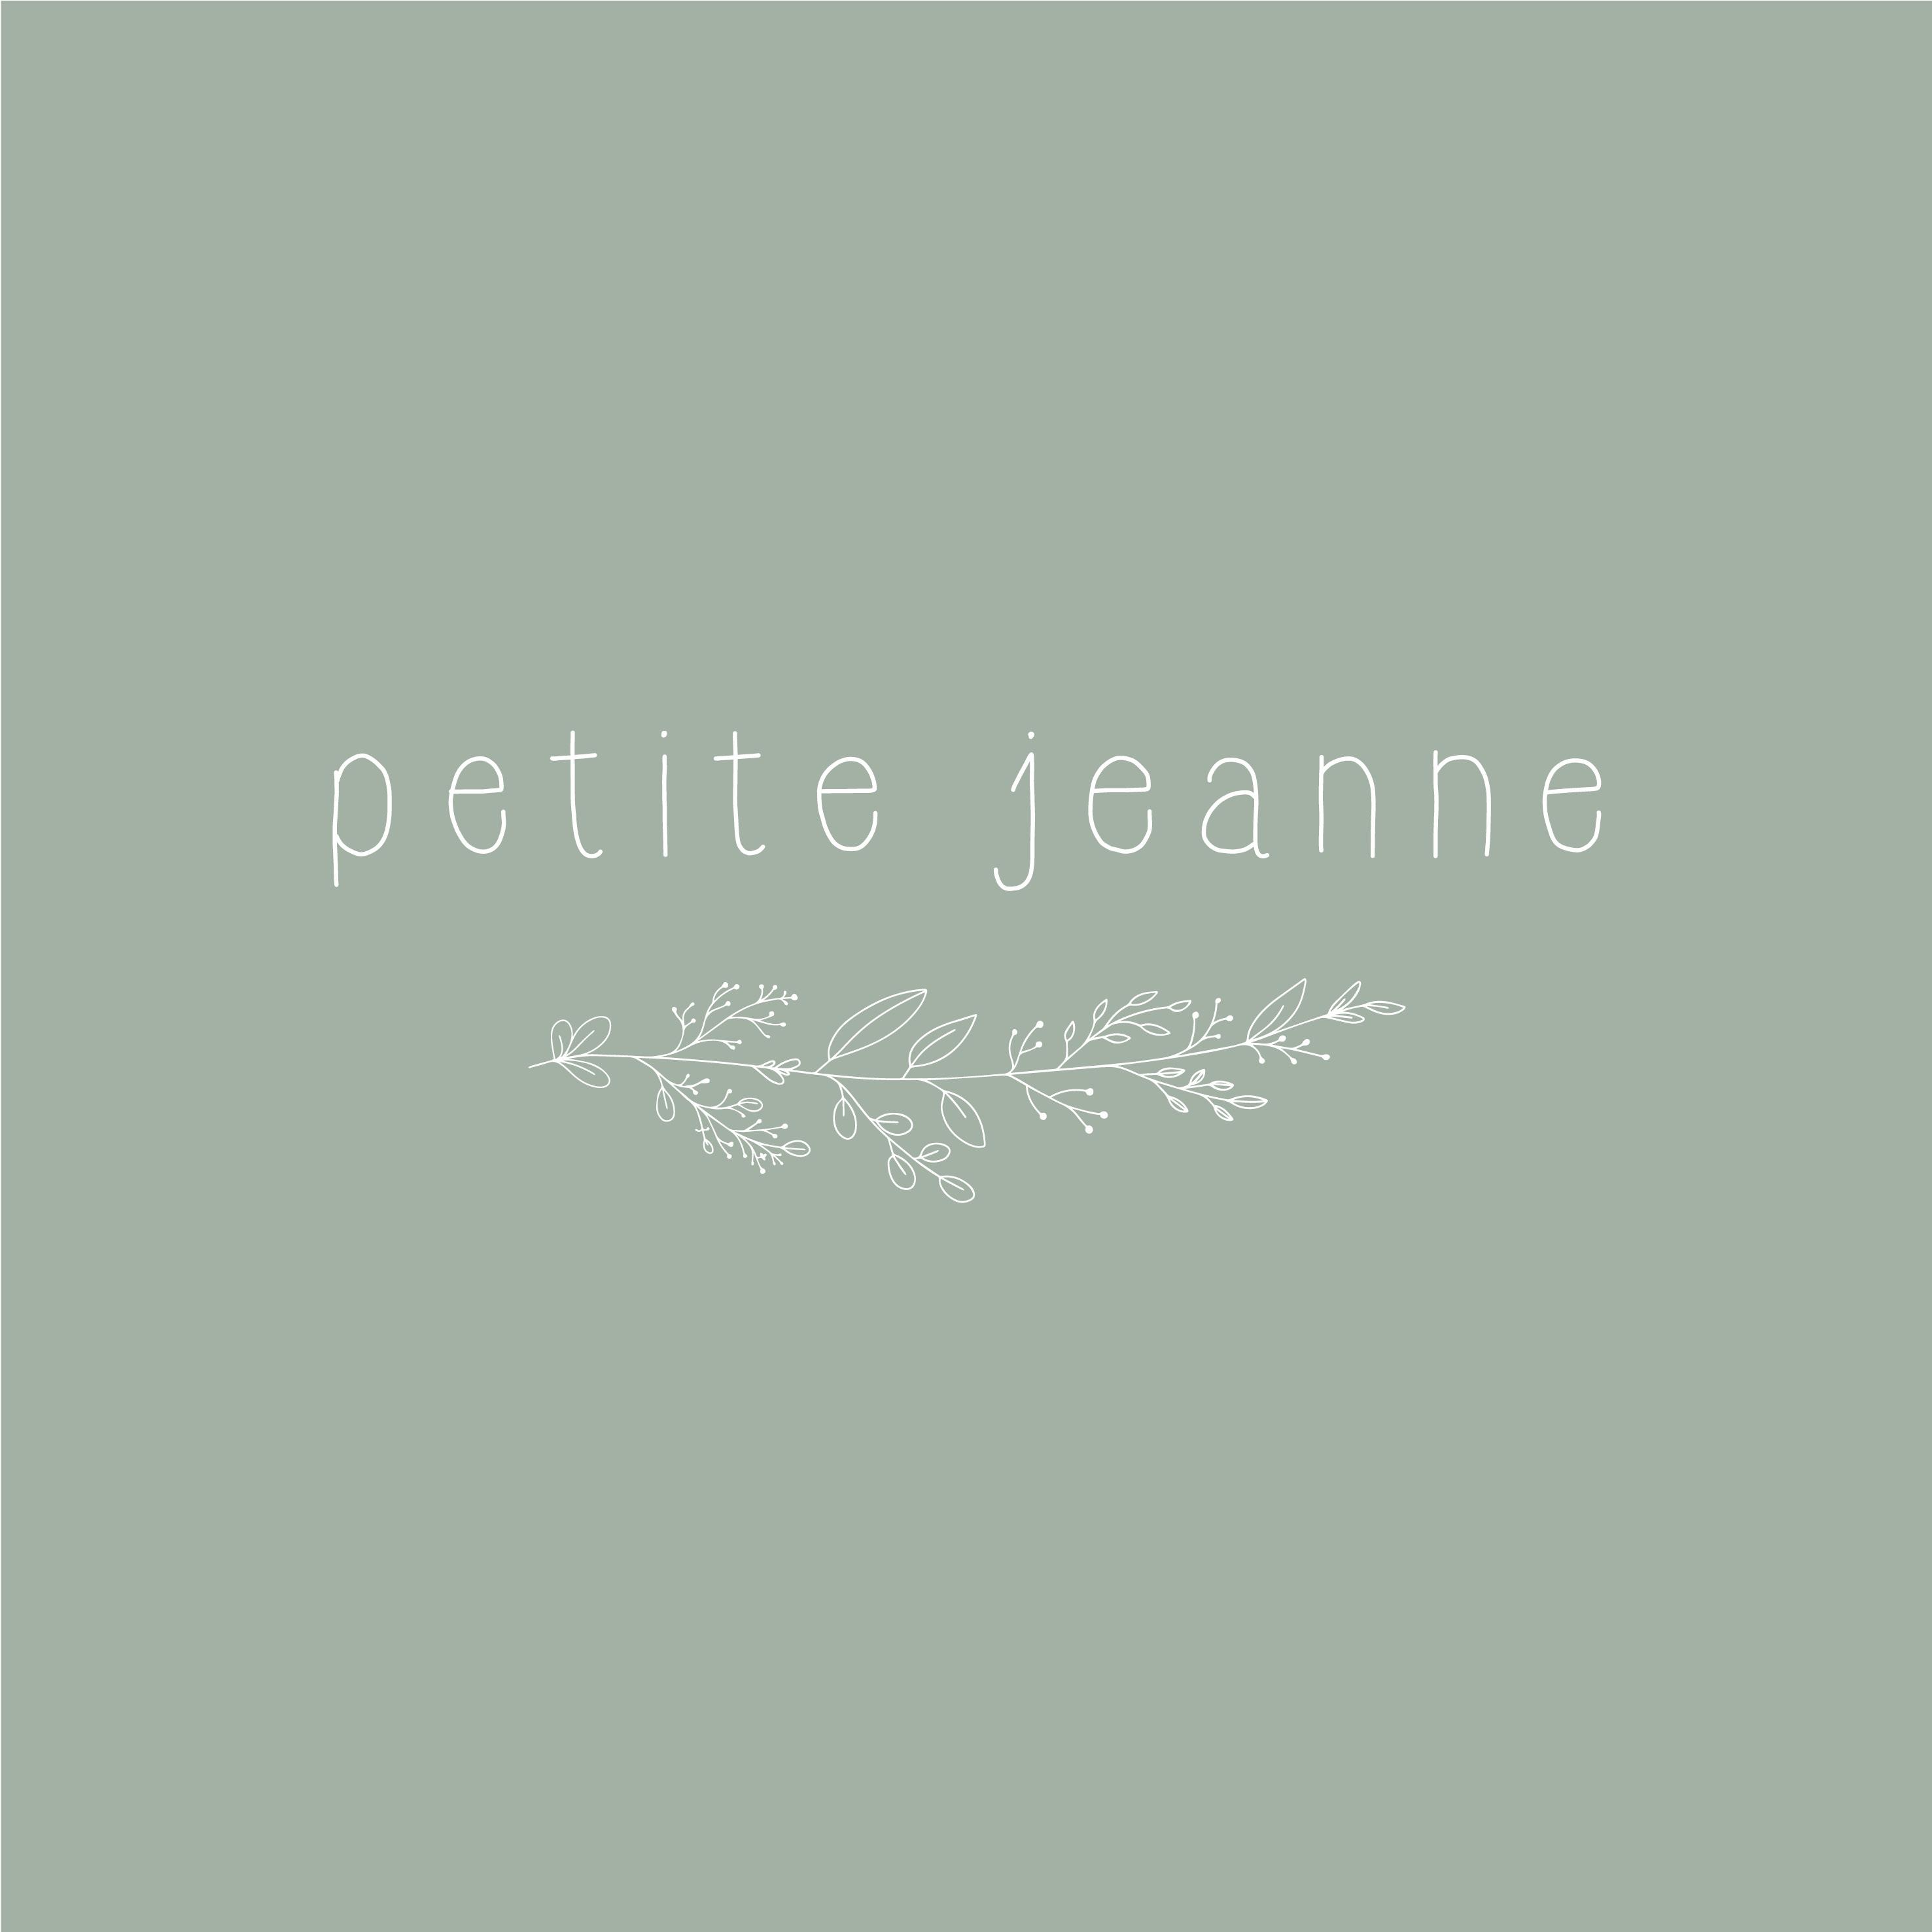 Petite jeanne